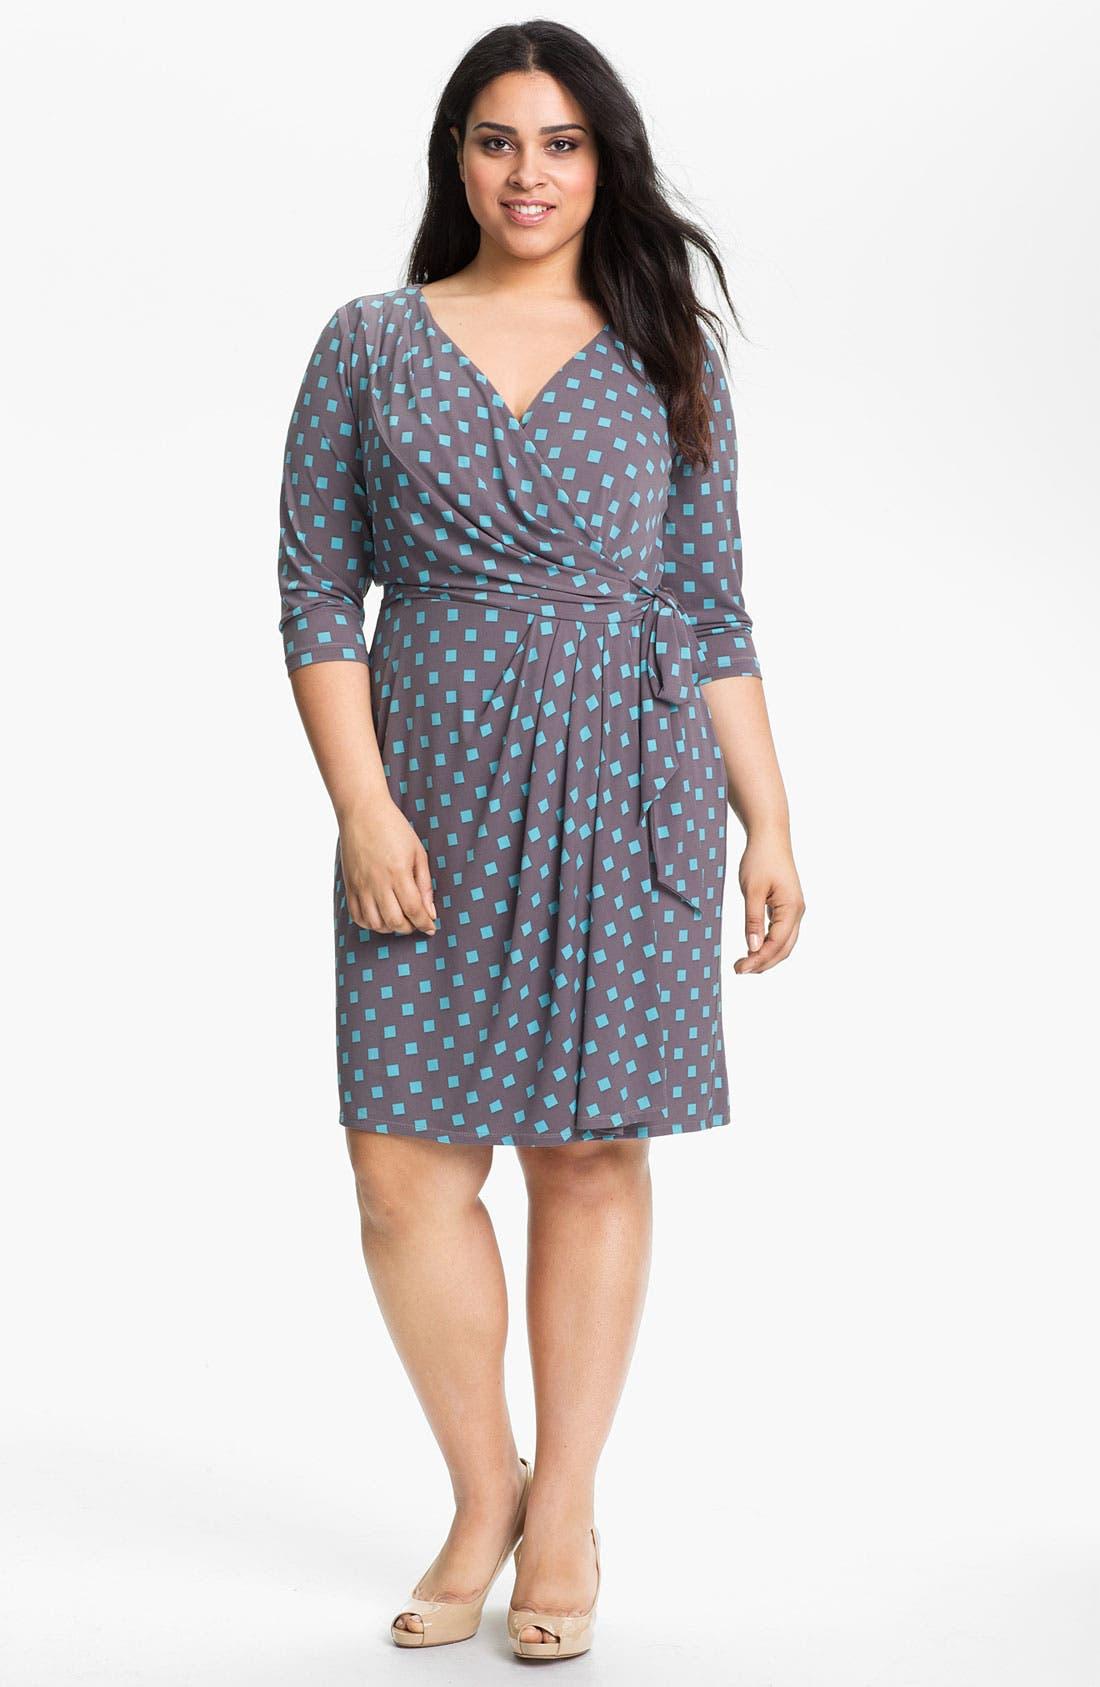 Main Image - Suzi Chin for Maggy Boutique Print Wrap Dress (Plus Size)